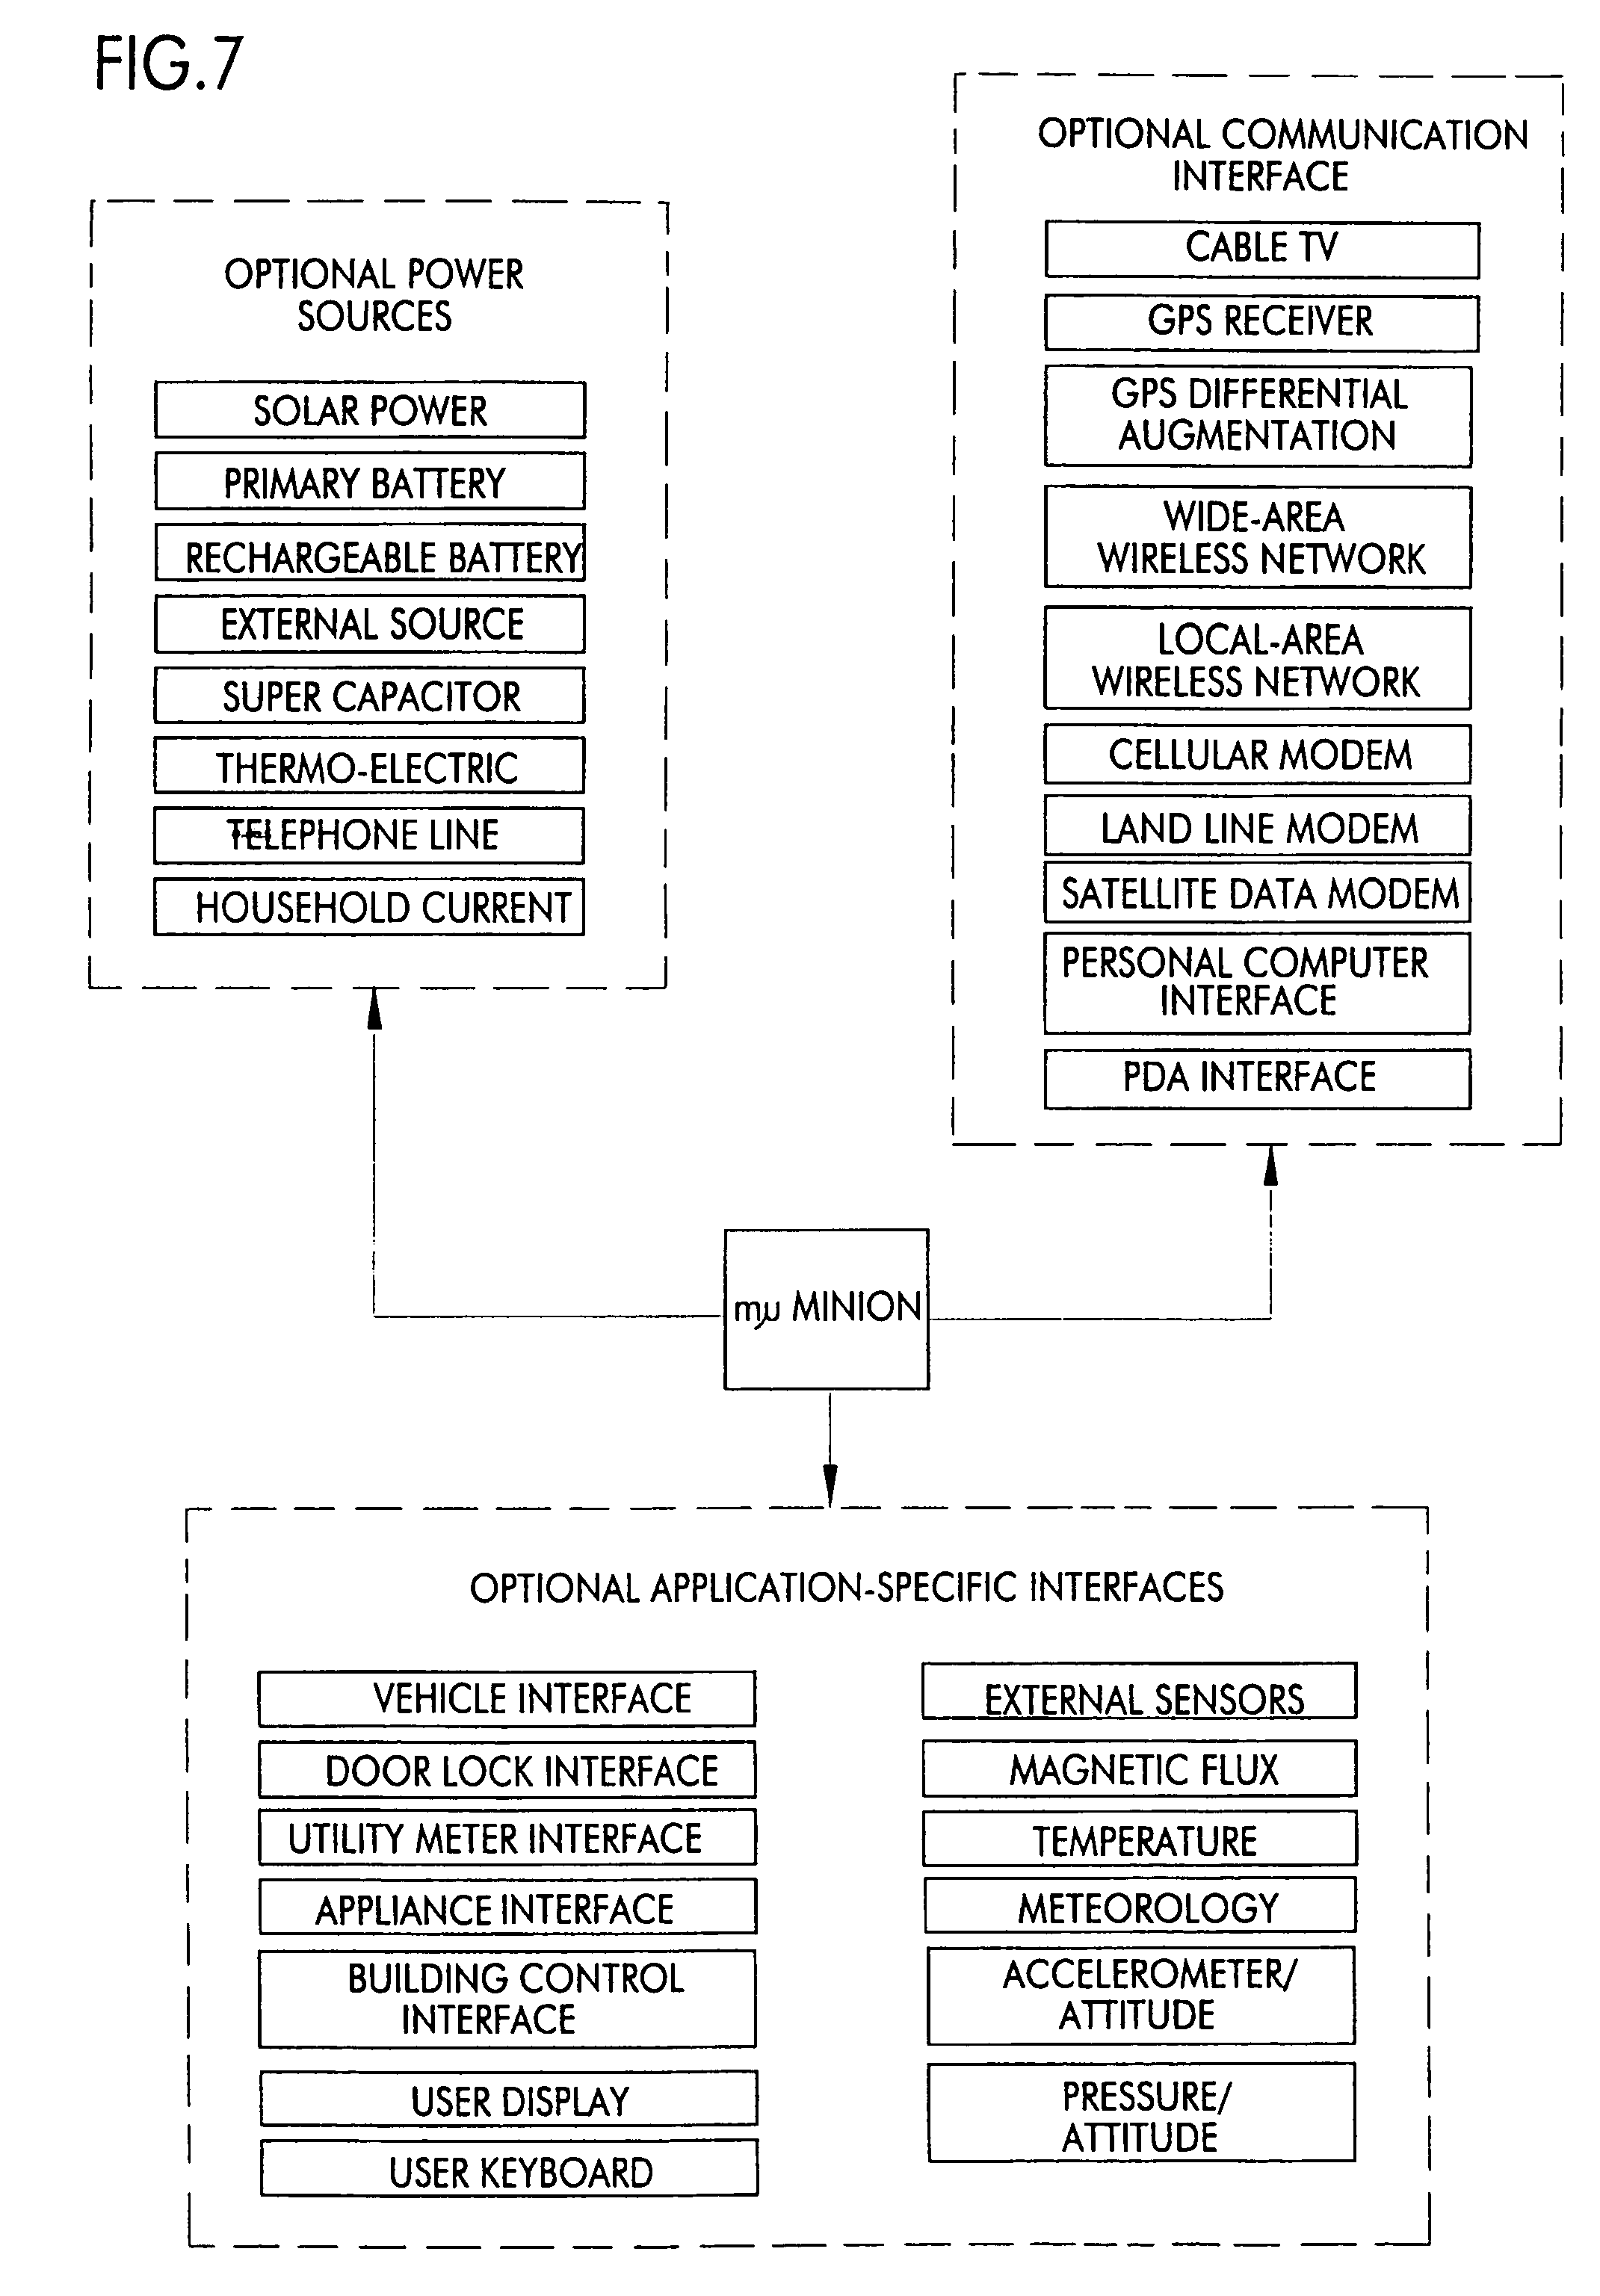 Patent US 7,653,394 B2